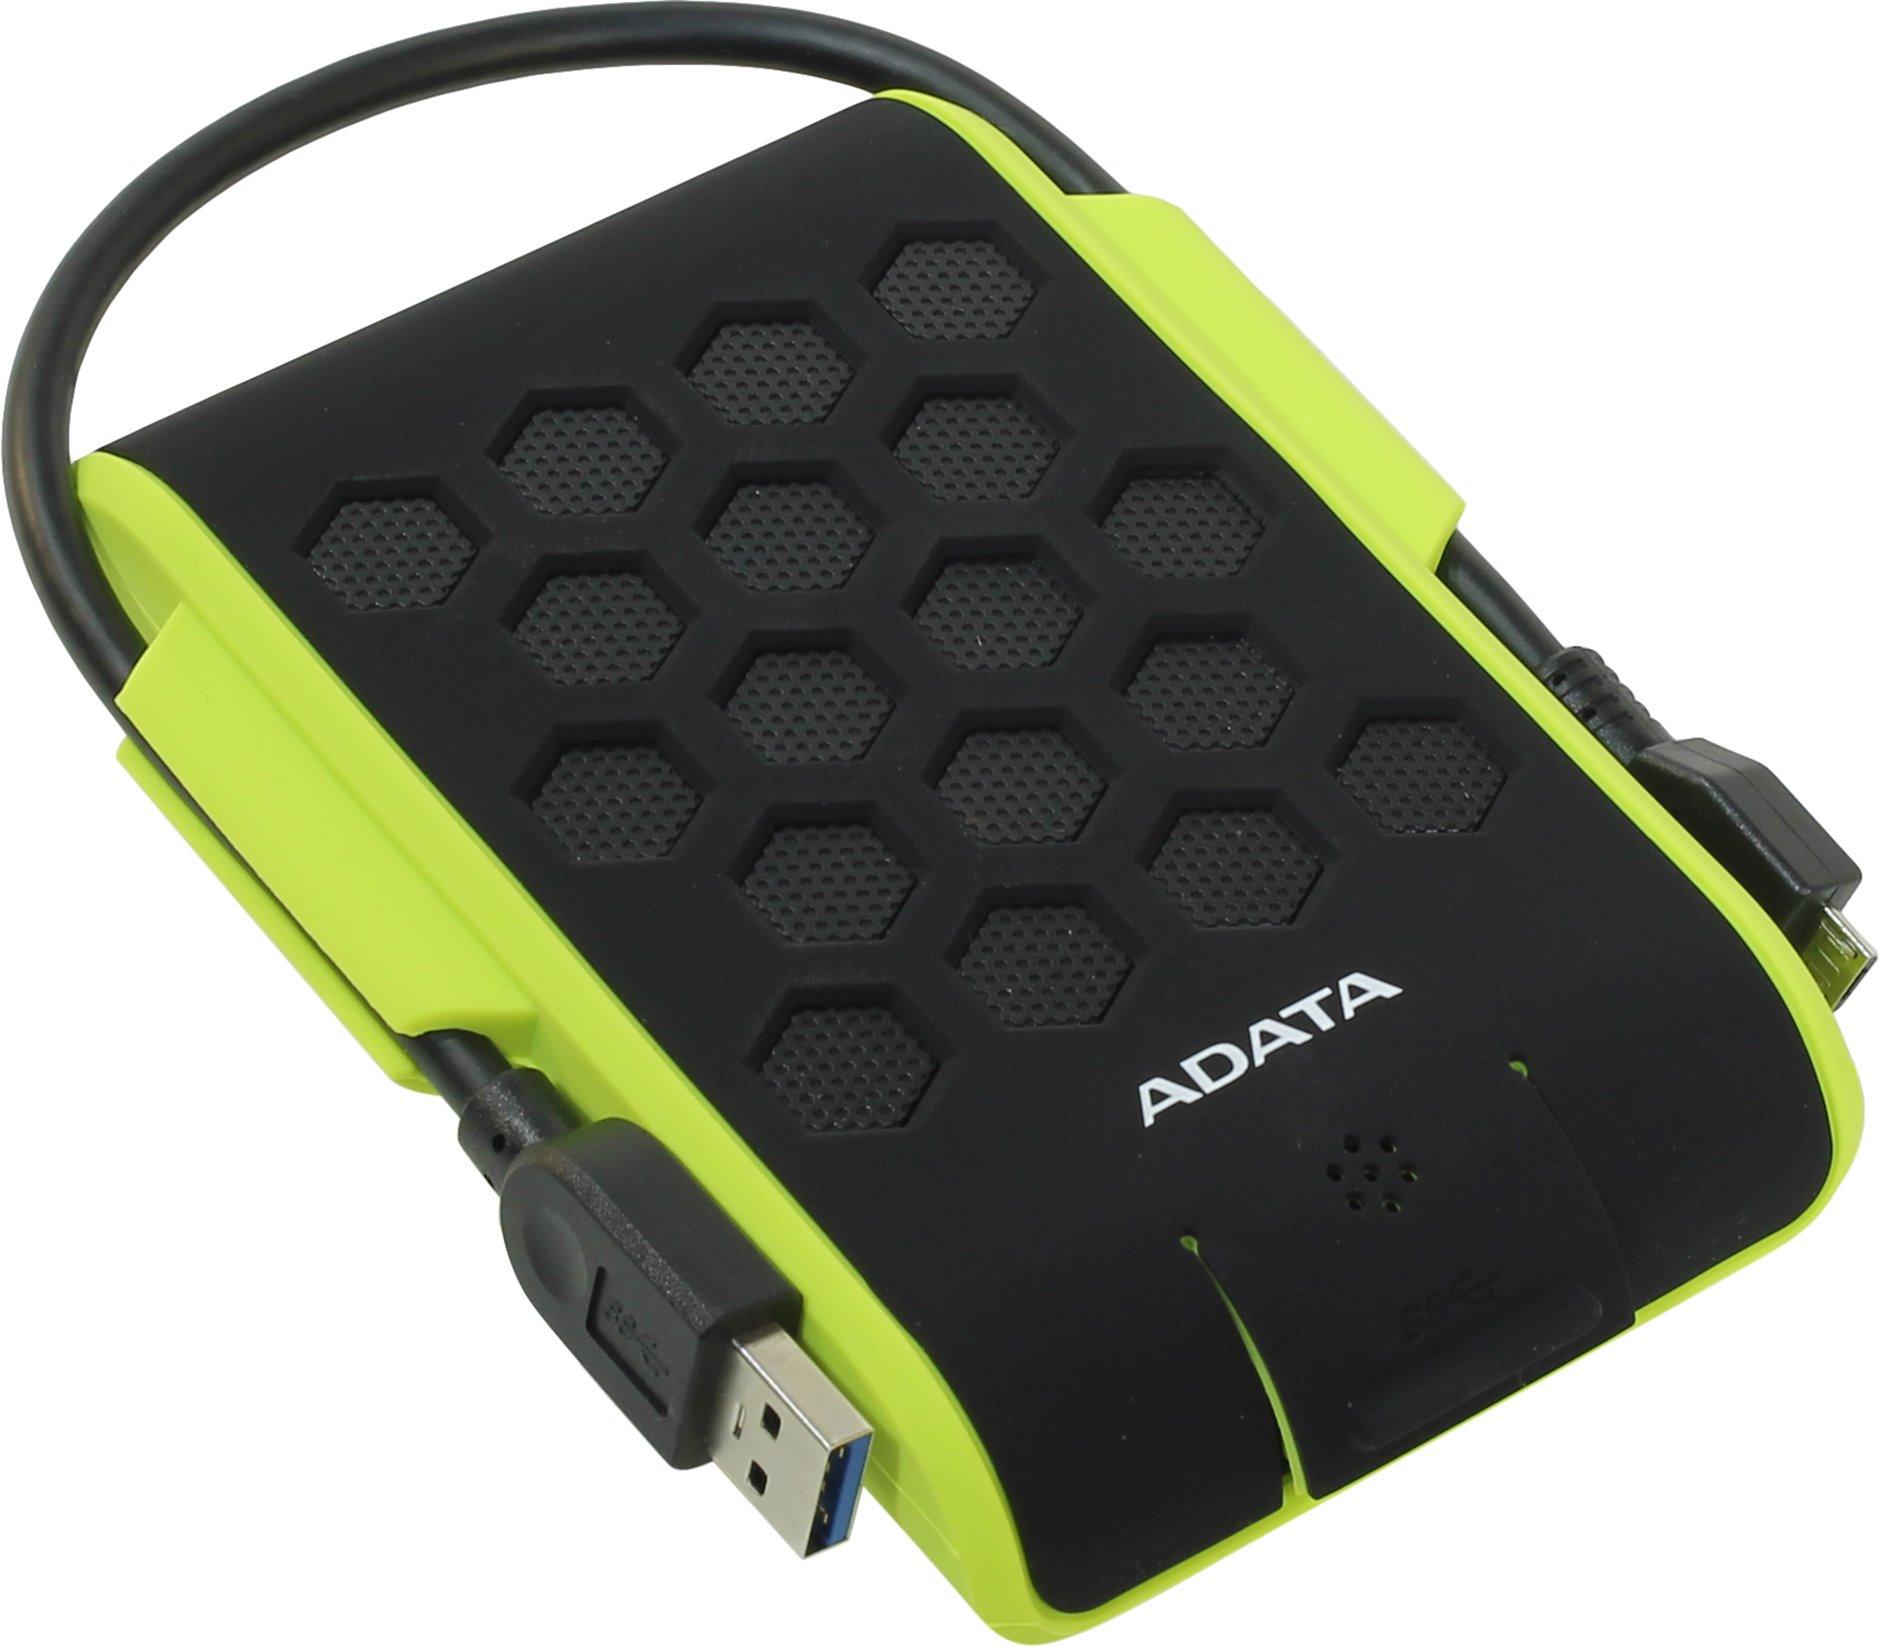 "HDD 2000Gb 2.5"", USB3.0, ADATA DashDrive Durable HD720, Rubber Green, IP68 Waterand Dust Resistant/Shock-Resistant(Military MIL-STD-810G 516.5 drop te 1"